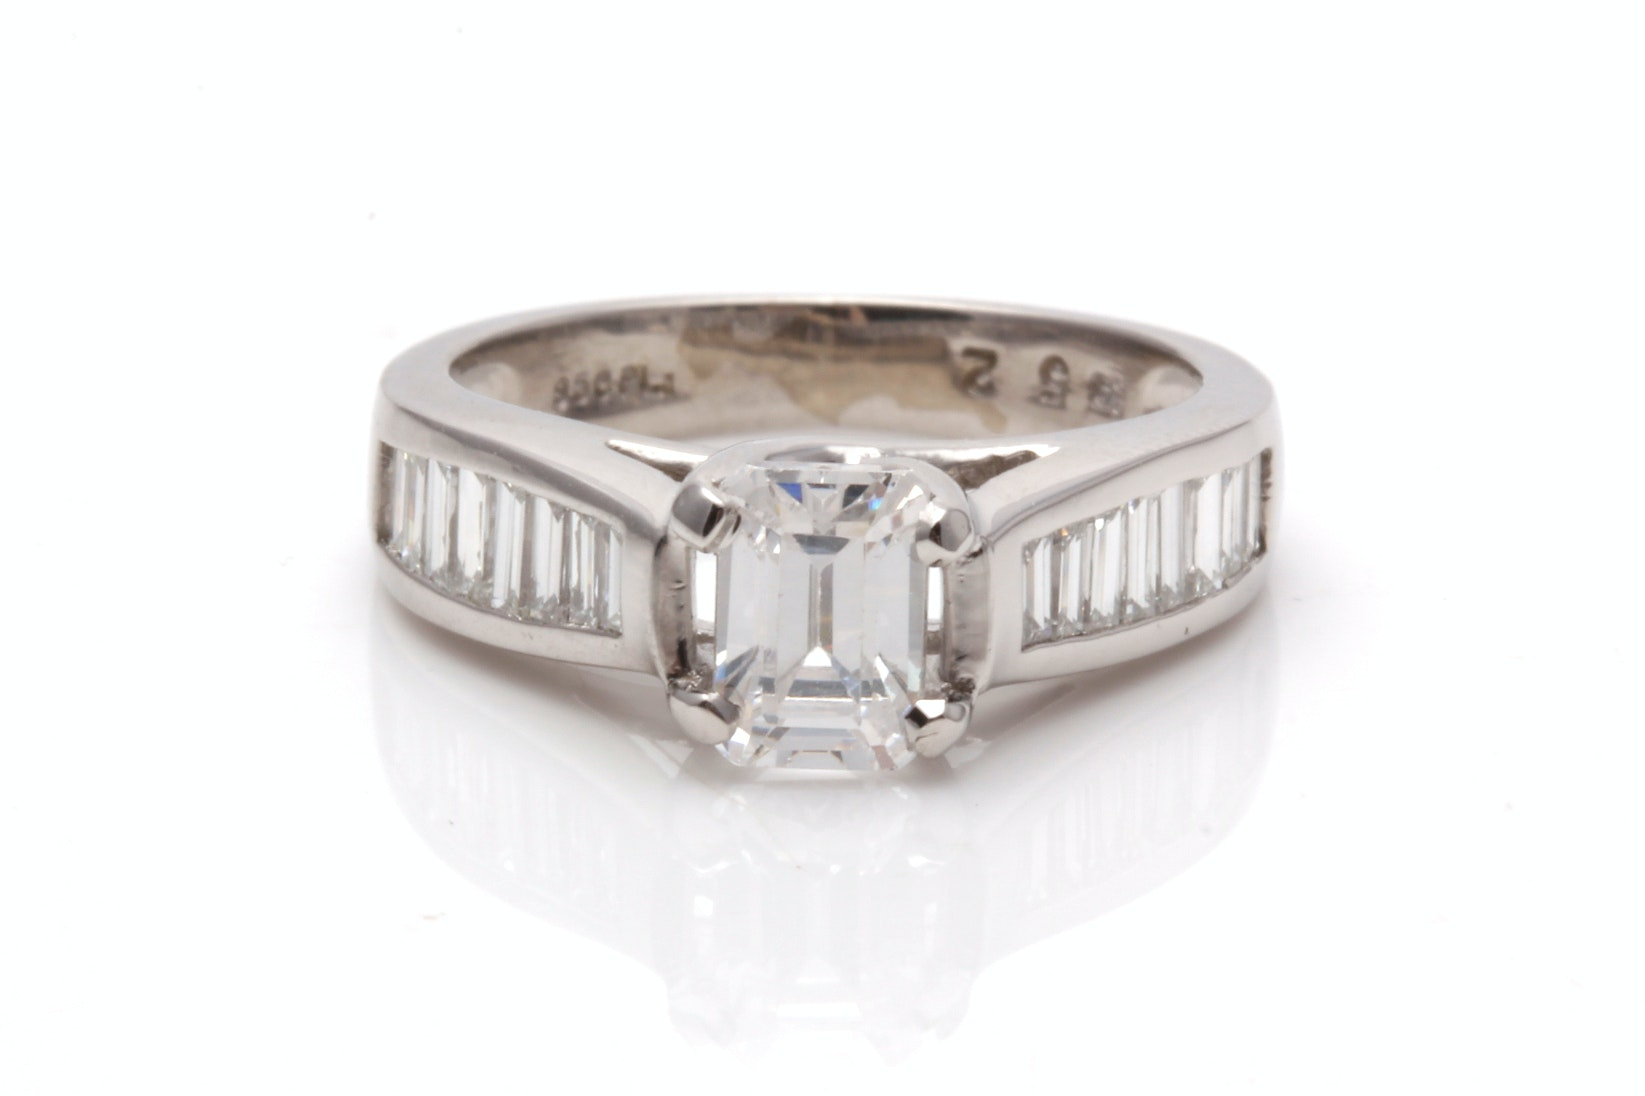 Platinum Diamond Semi Mount Ring With Cubic Zirconia Center Stone